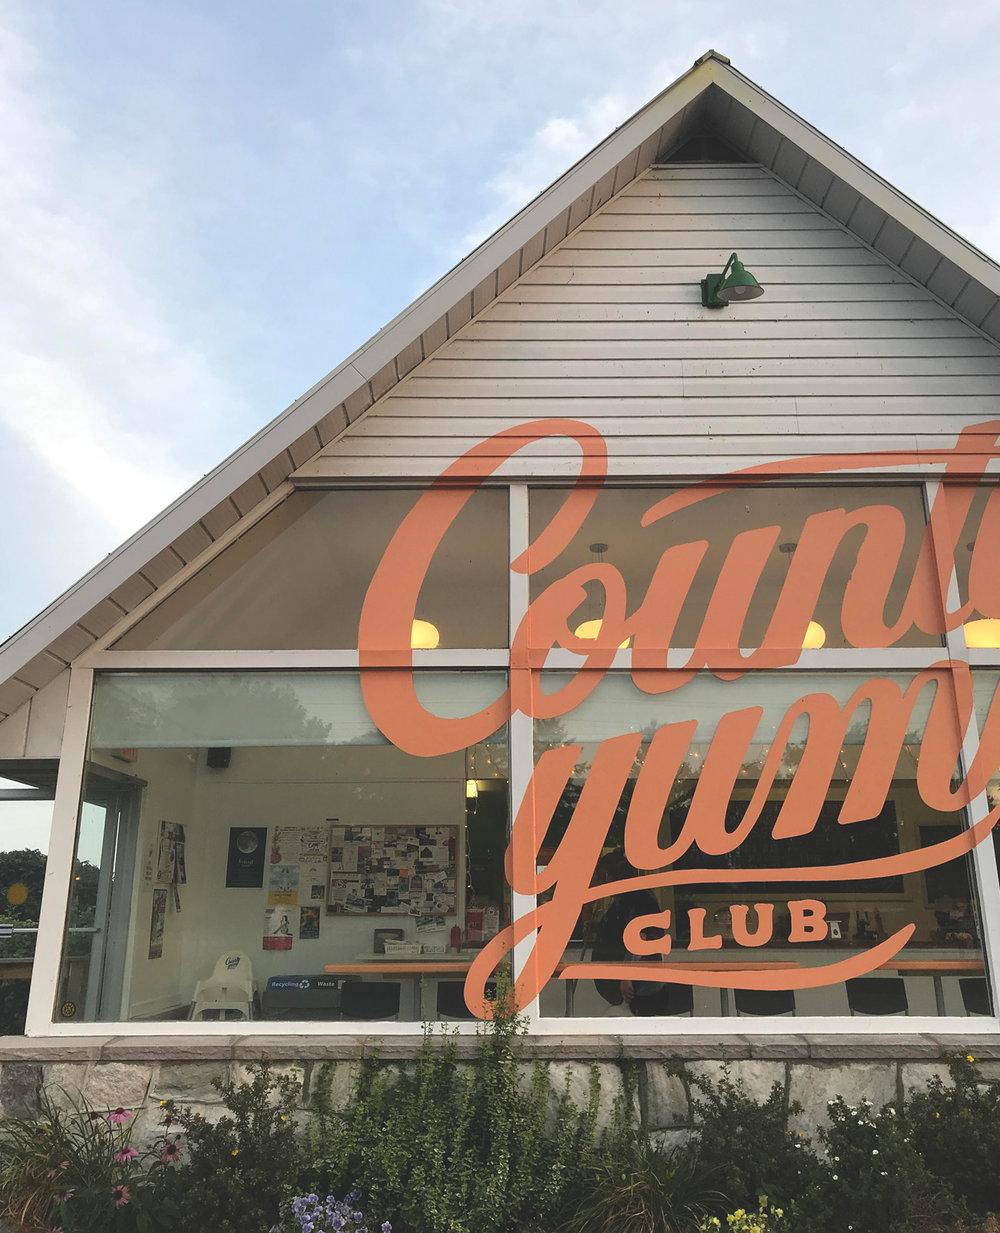 County Yum Club